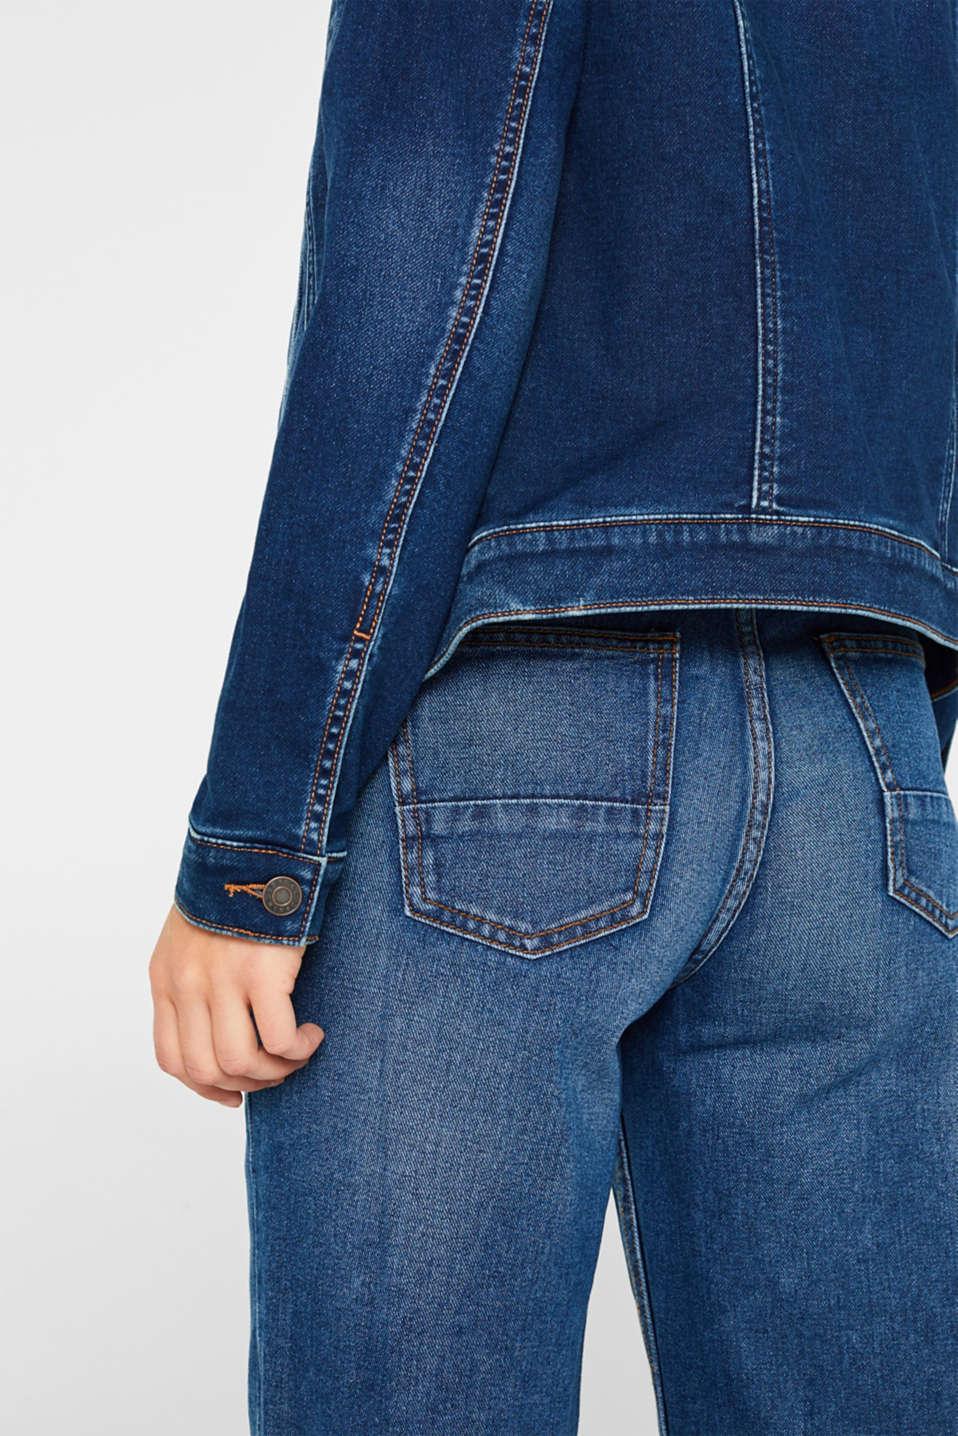 Jackets indoor denim, BLUE DARK WASH, detail image number 2